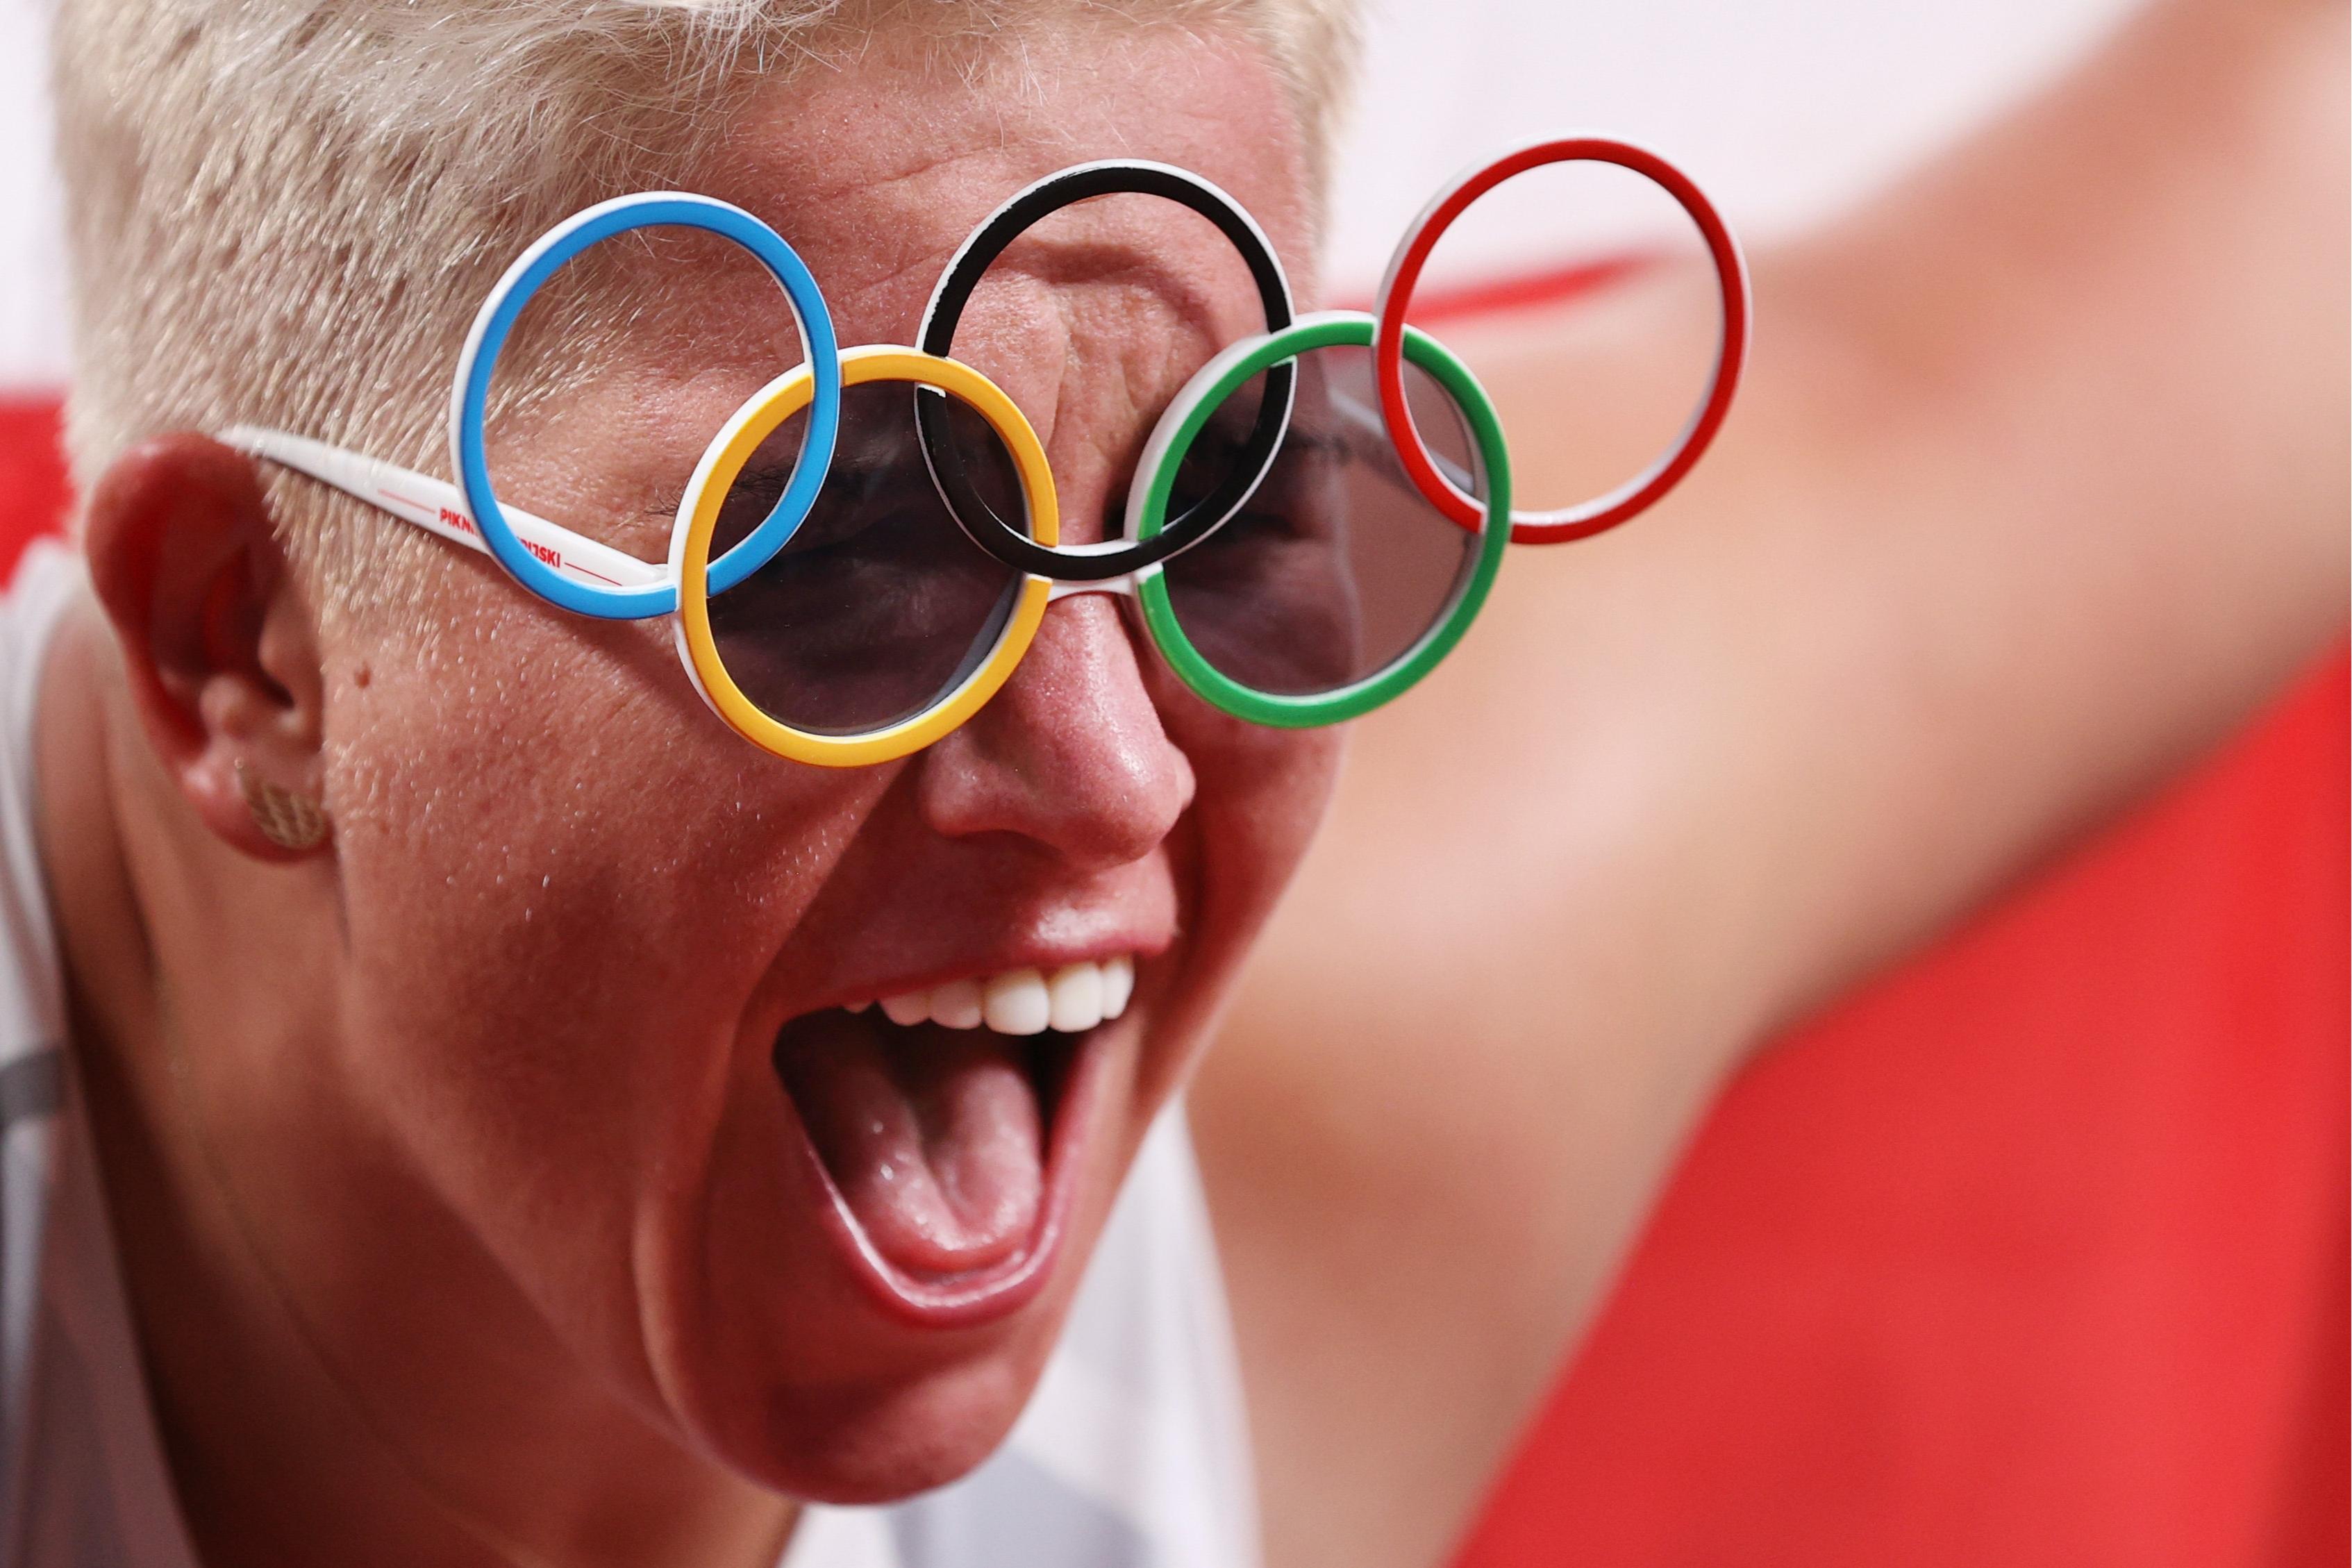 Фото: Анита Влодарчик (Photo by Patrick Smith / Getty Images)